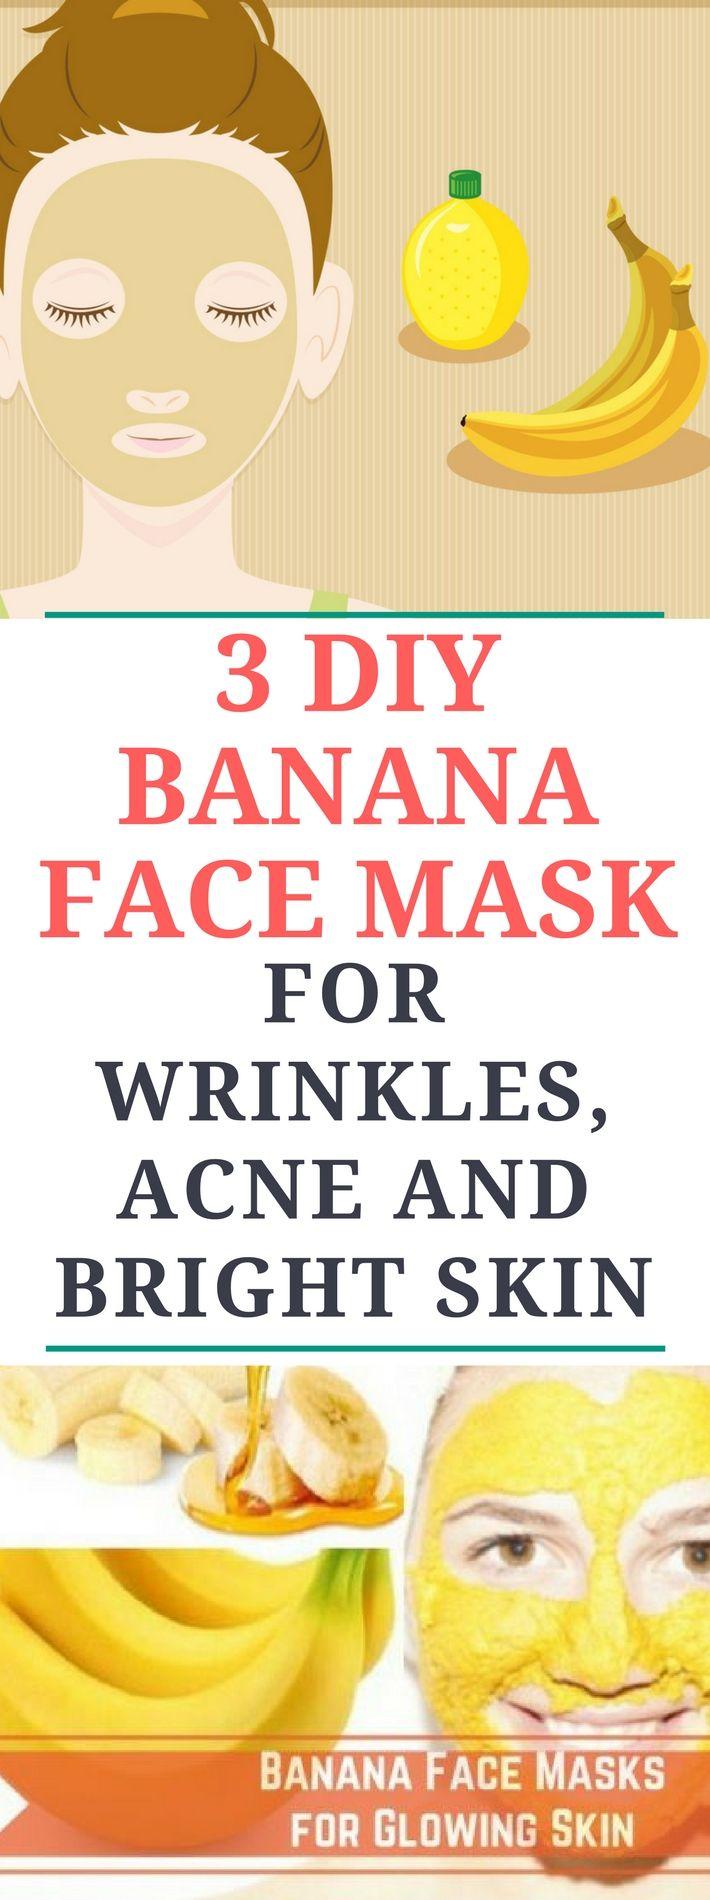 3 DIY Banana Face Mask For Wrinkles, Acne and Bright Skin.. Read.!!! . . , #skincare #skinperfect #skincareman #skincareluxury #beauty #health #beautytips #draven #lol #leagueoflegends #adc #new #santaclaus #christmas #linkinbio #allnatural #allnaturalbeauty #organic #nochemicals #spa #madeintheusa #crueltyfree #crueltyfreebeauty #crueltyfreemakeup #treatyourself